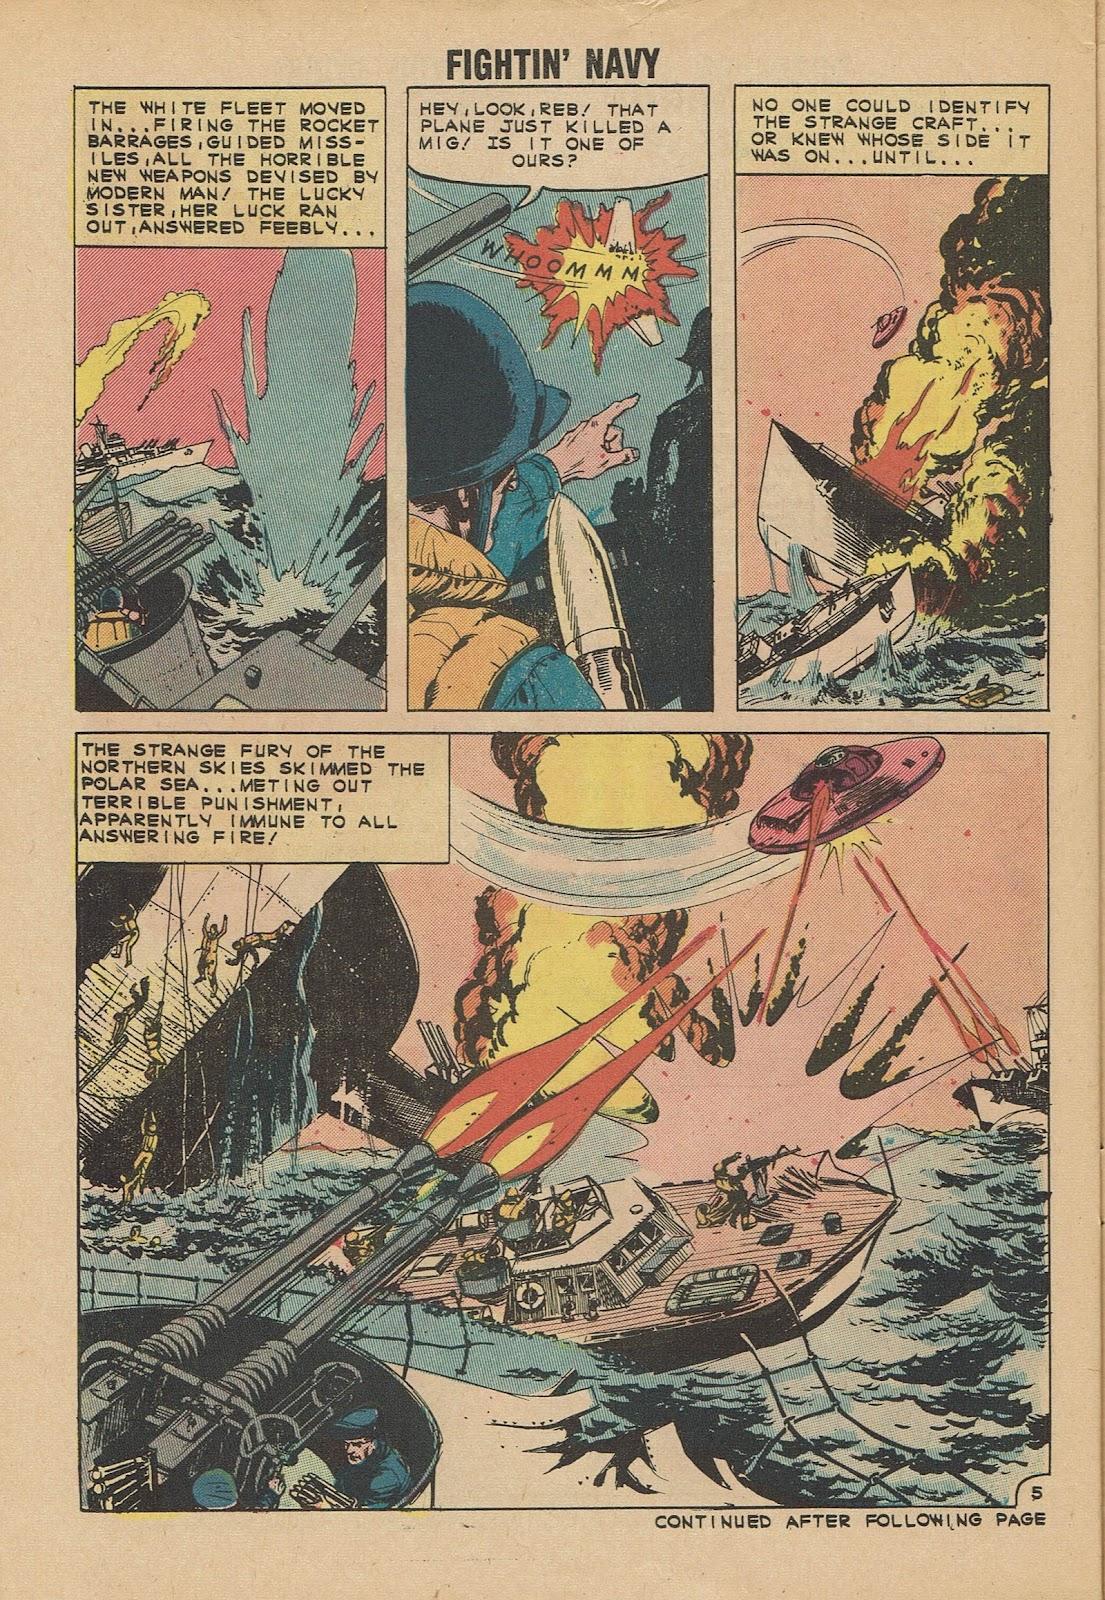 Read online Fightin' Navy comic -  Issue #101 - 30